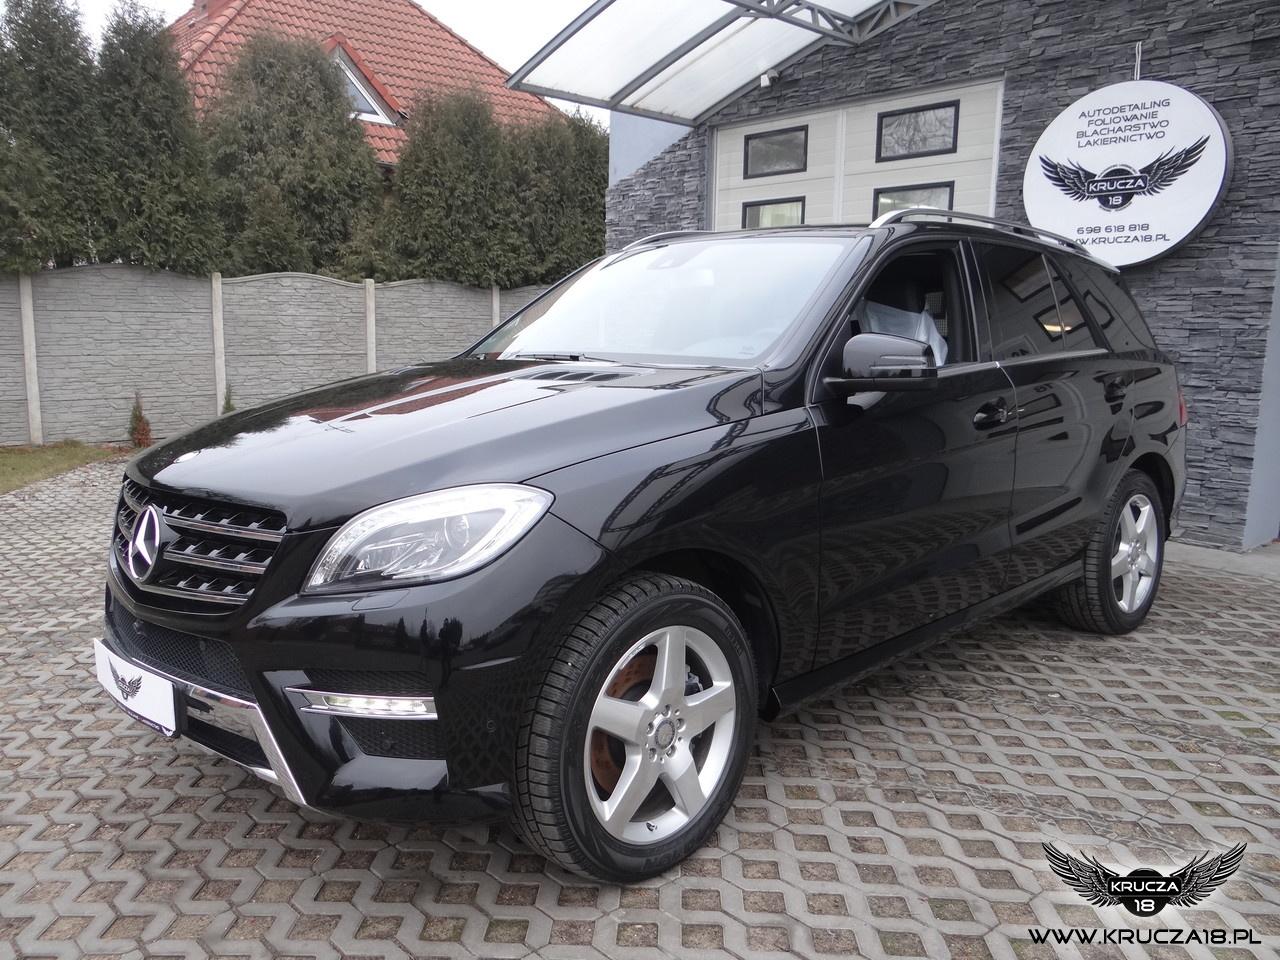 Mercedes ML - CERAMIC PRO 9H + STONE PROTECT